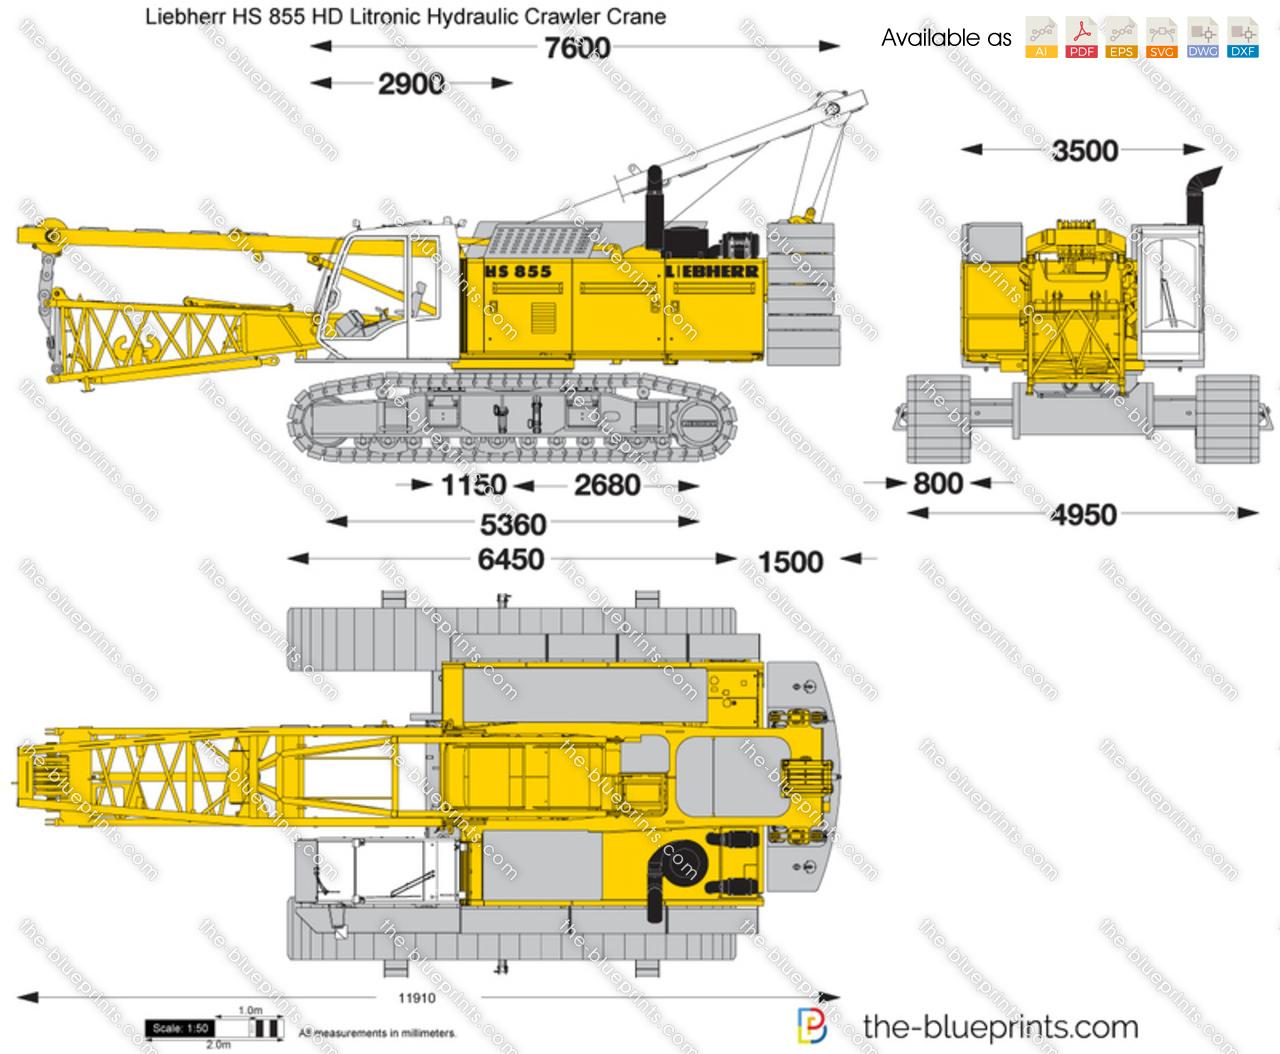 Liebherr HS 855 HD Litronic Hydraulic Crawler Crane vector